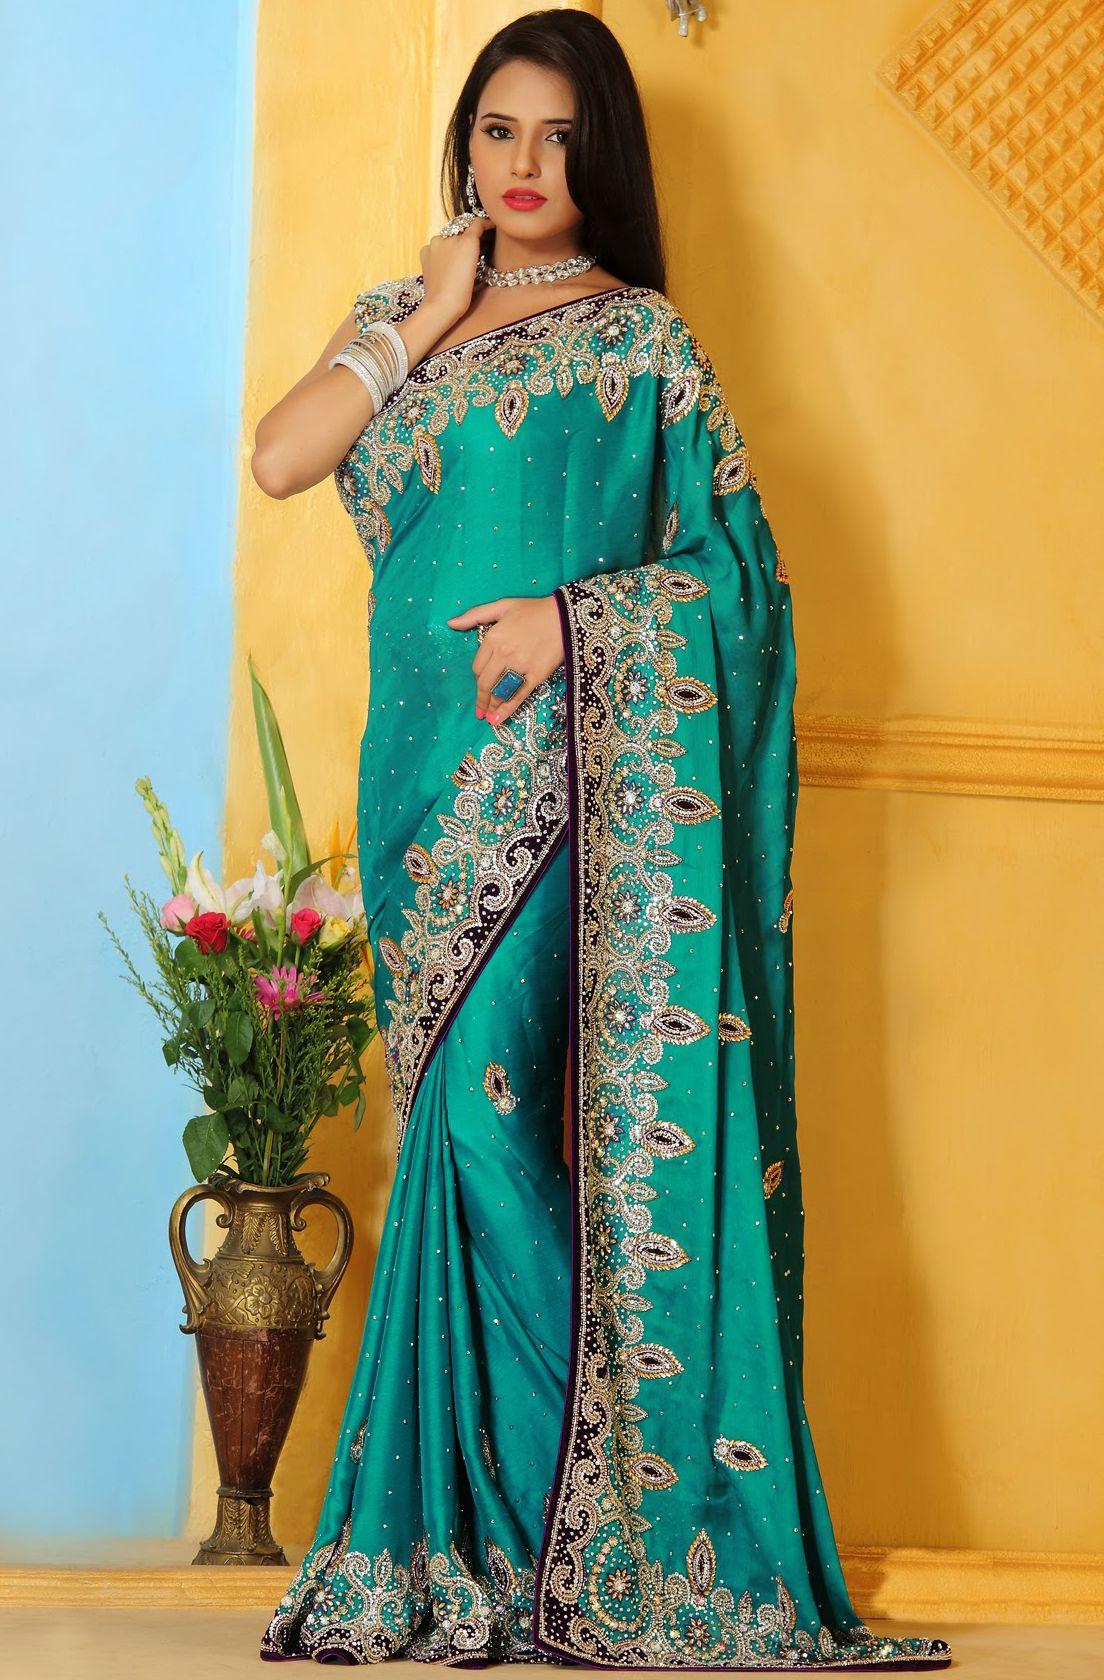 Indian Bridal #Turquoise #Satin Saree with #Blouse   @ $ 321.5 ...